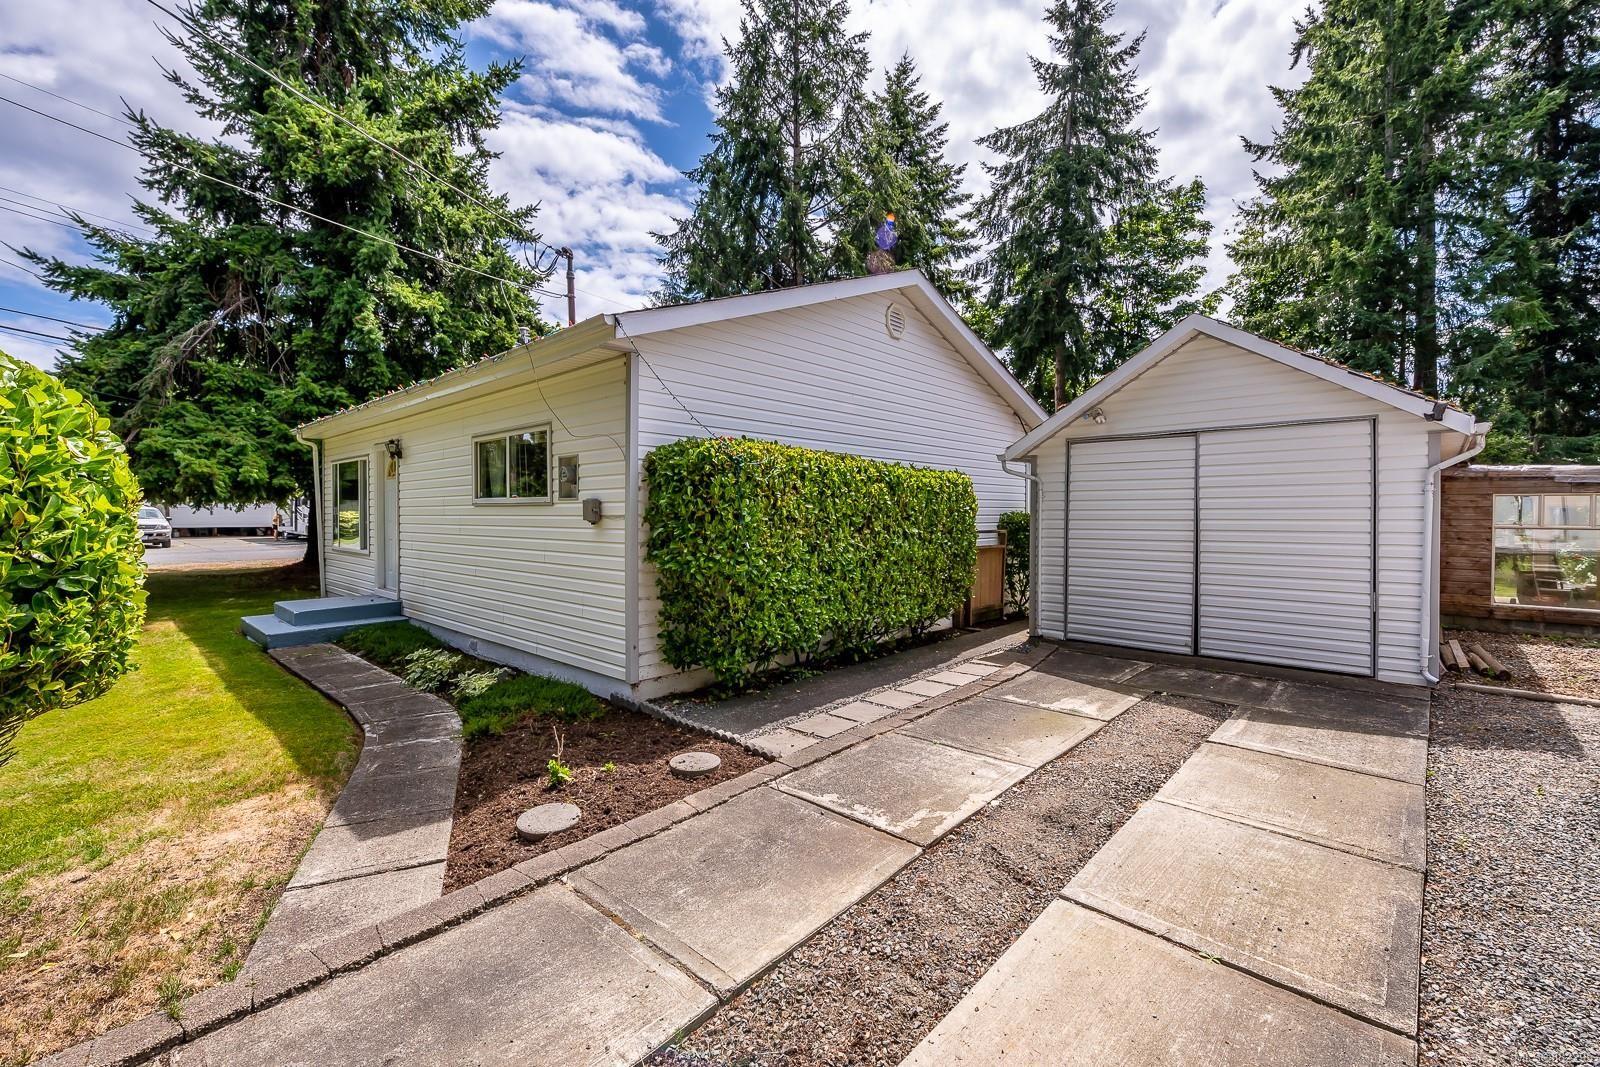 Main Photo: 2103 Saratoga Rd in : CV Merville Black Creek House for sale (Comox Valley)  : MLS®# 882295